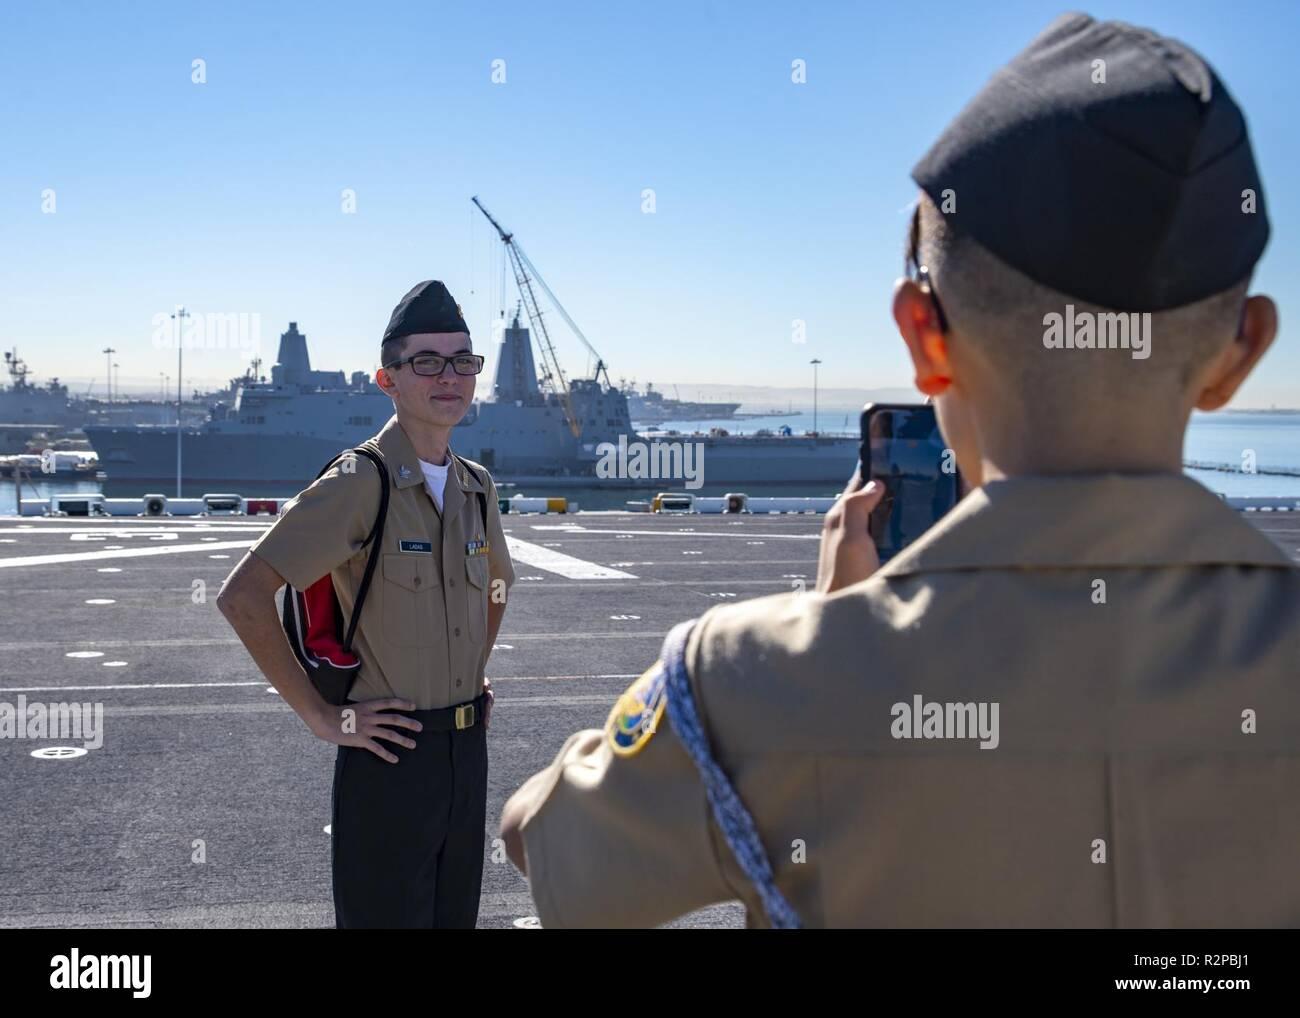 SAN DIEGO (Nov  2, 2018) A Navy Junior Reserve Officer Training